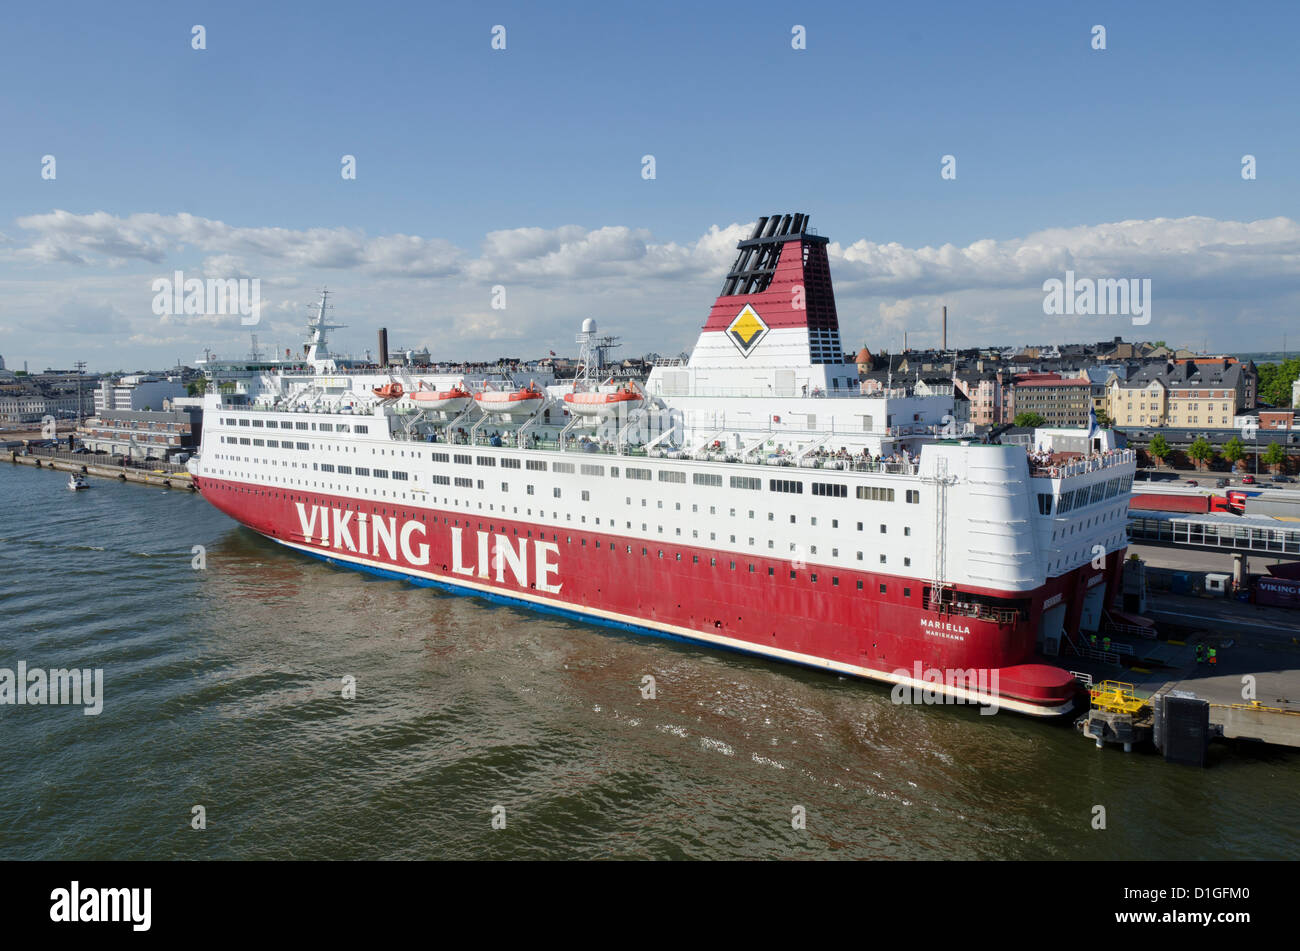 Viking Line Chat